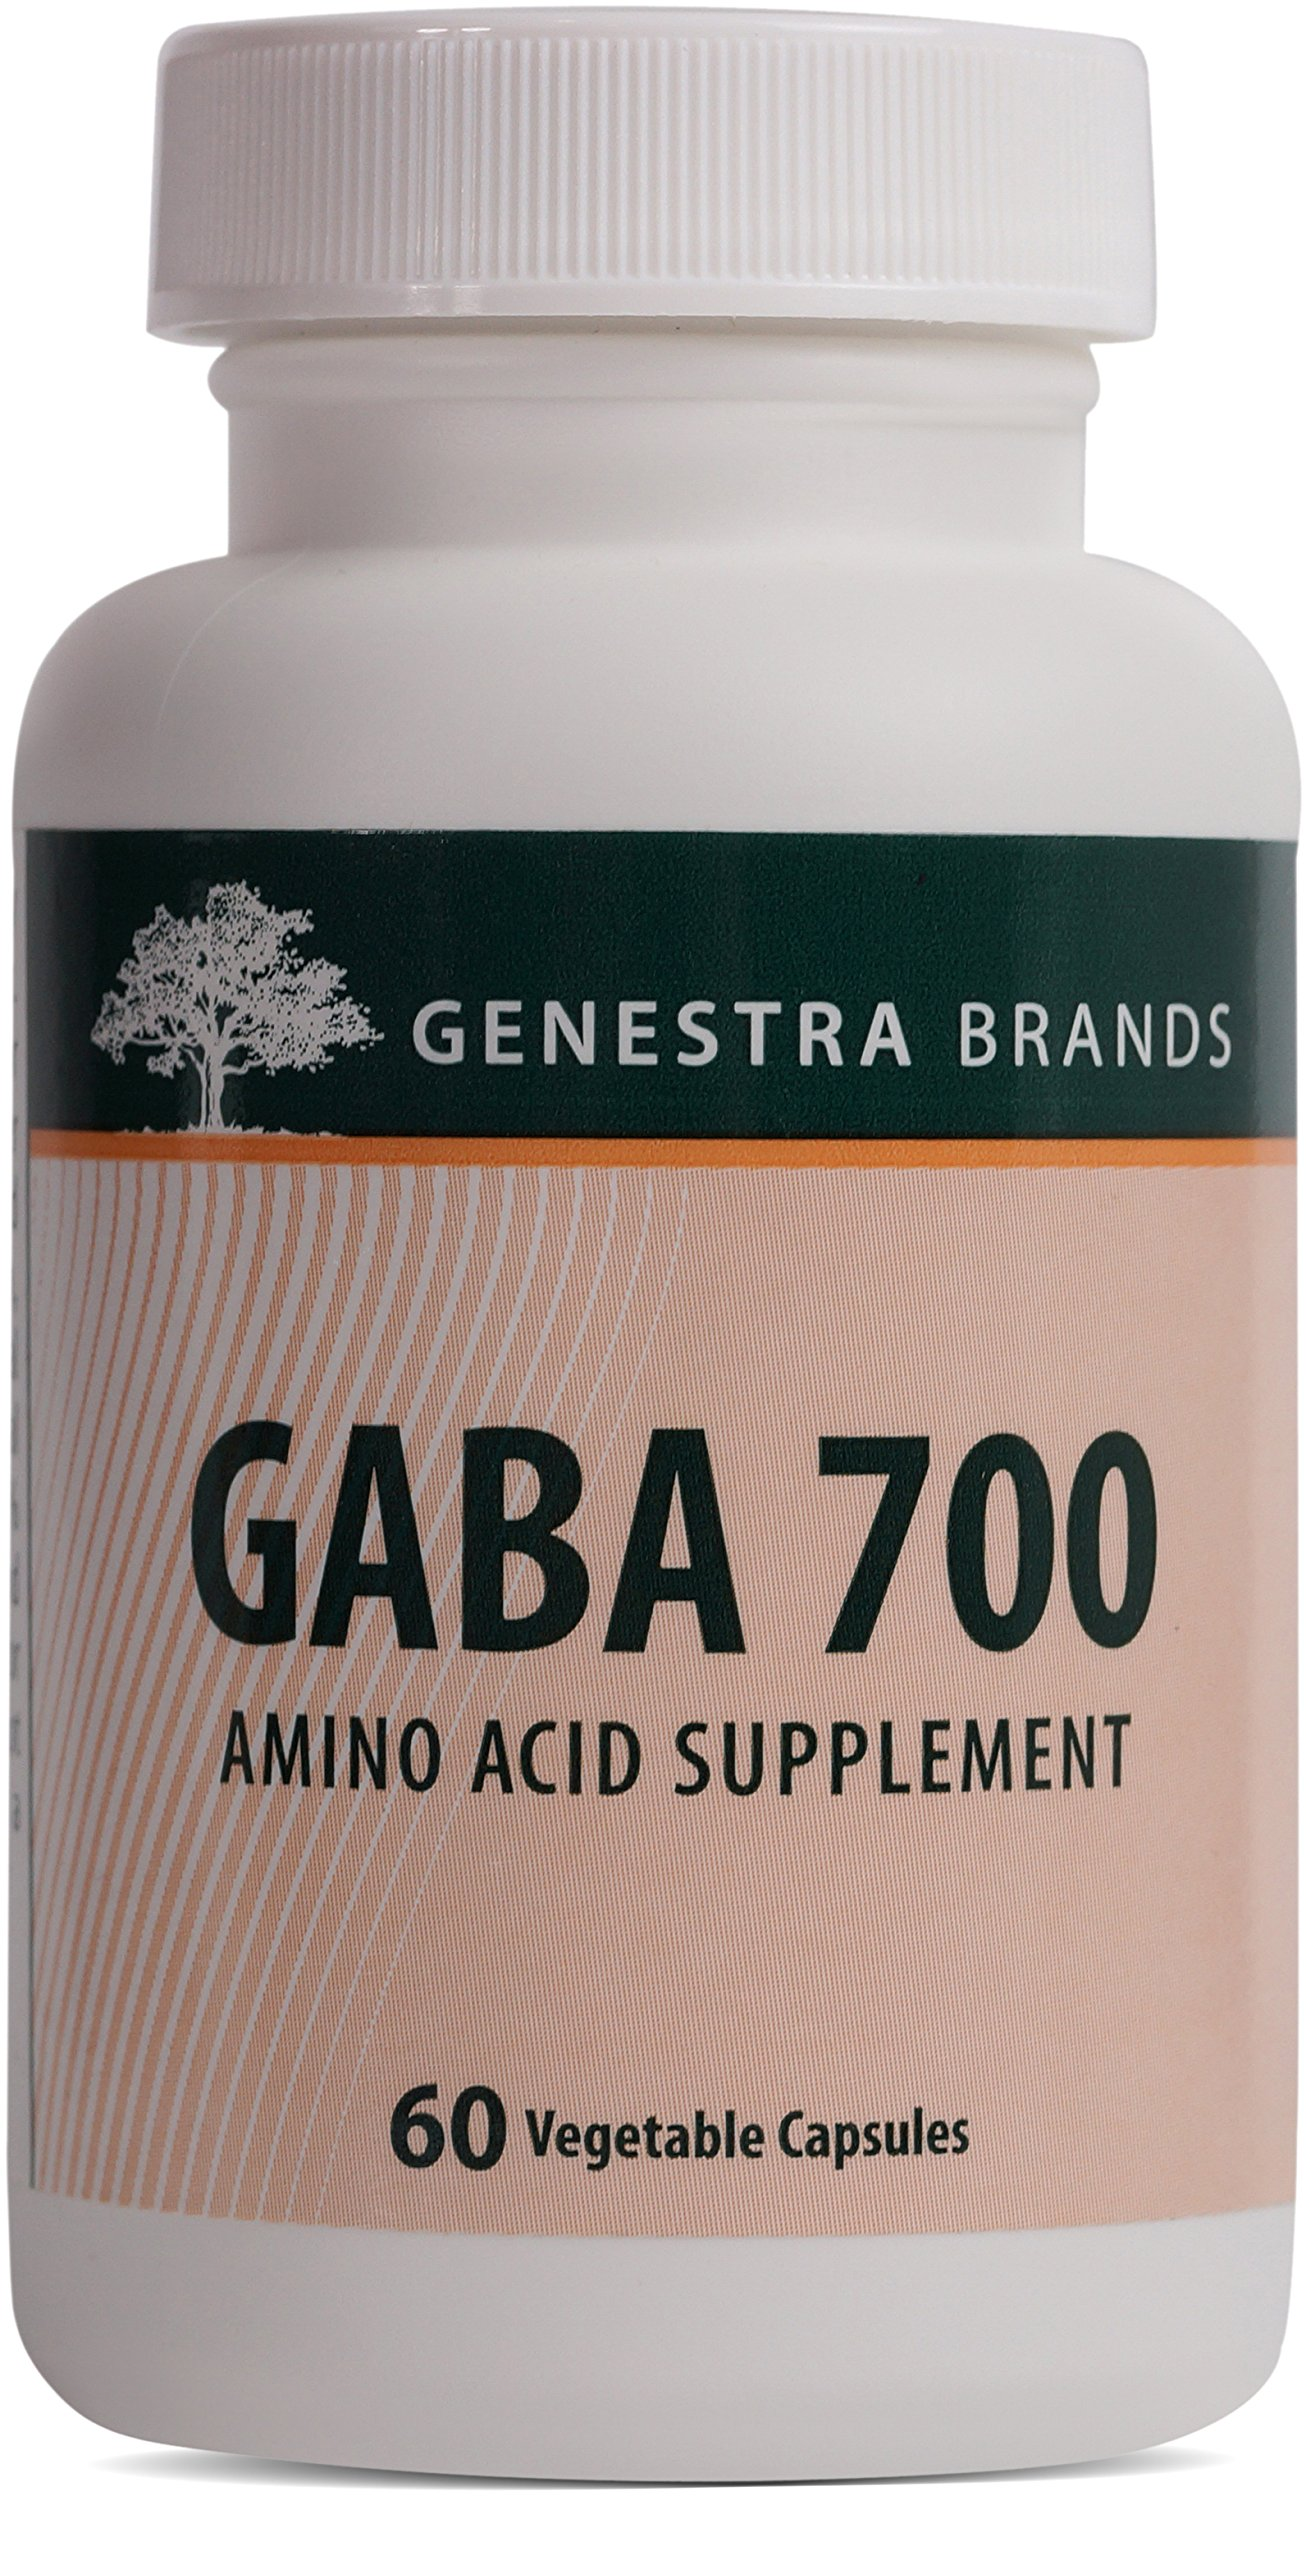 Genestra Brands - GABA 700 - Gamma-Aminobutyric Acid Formulation - 60 Capsules